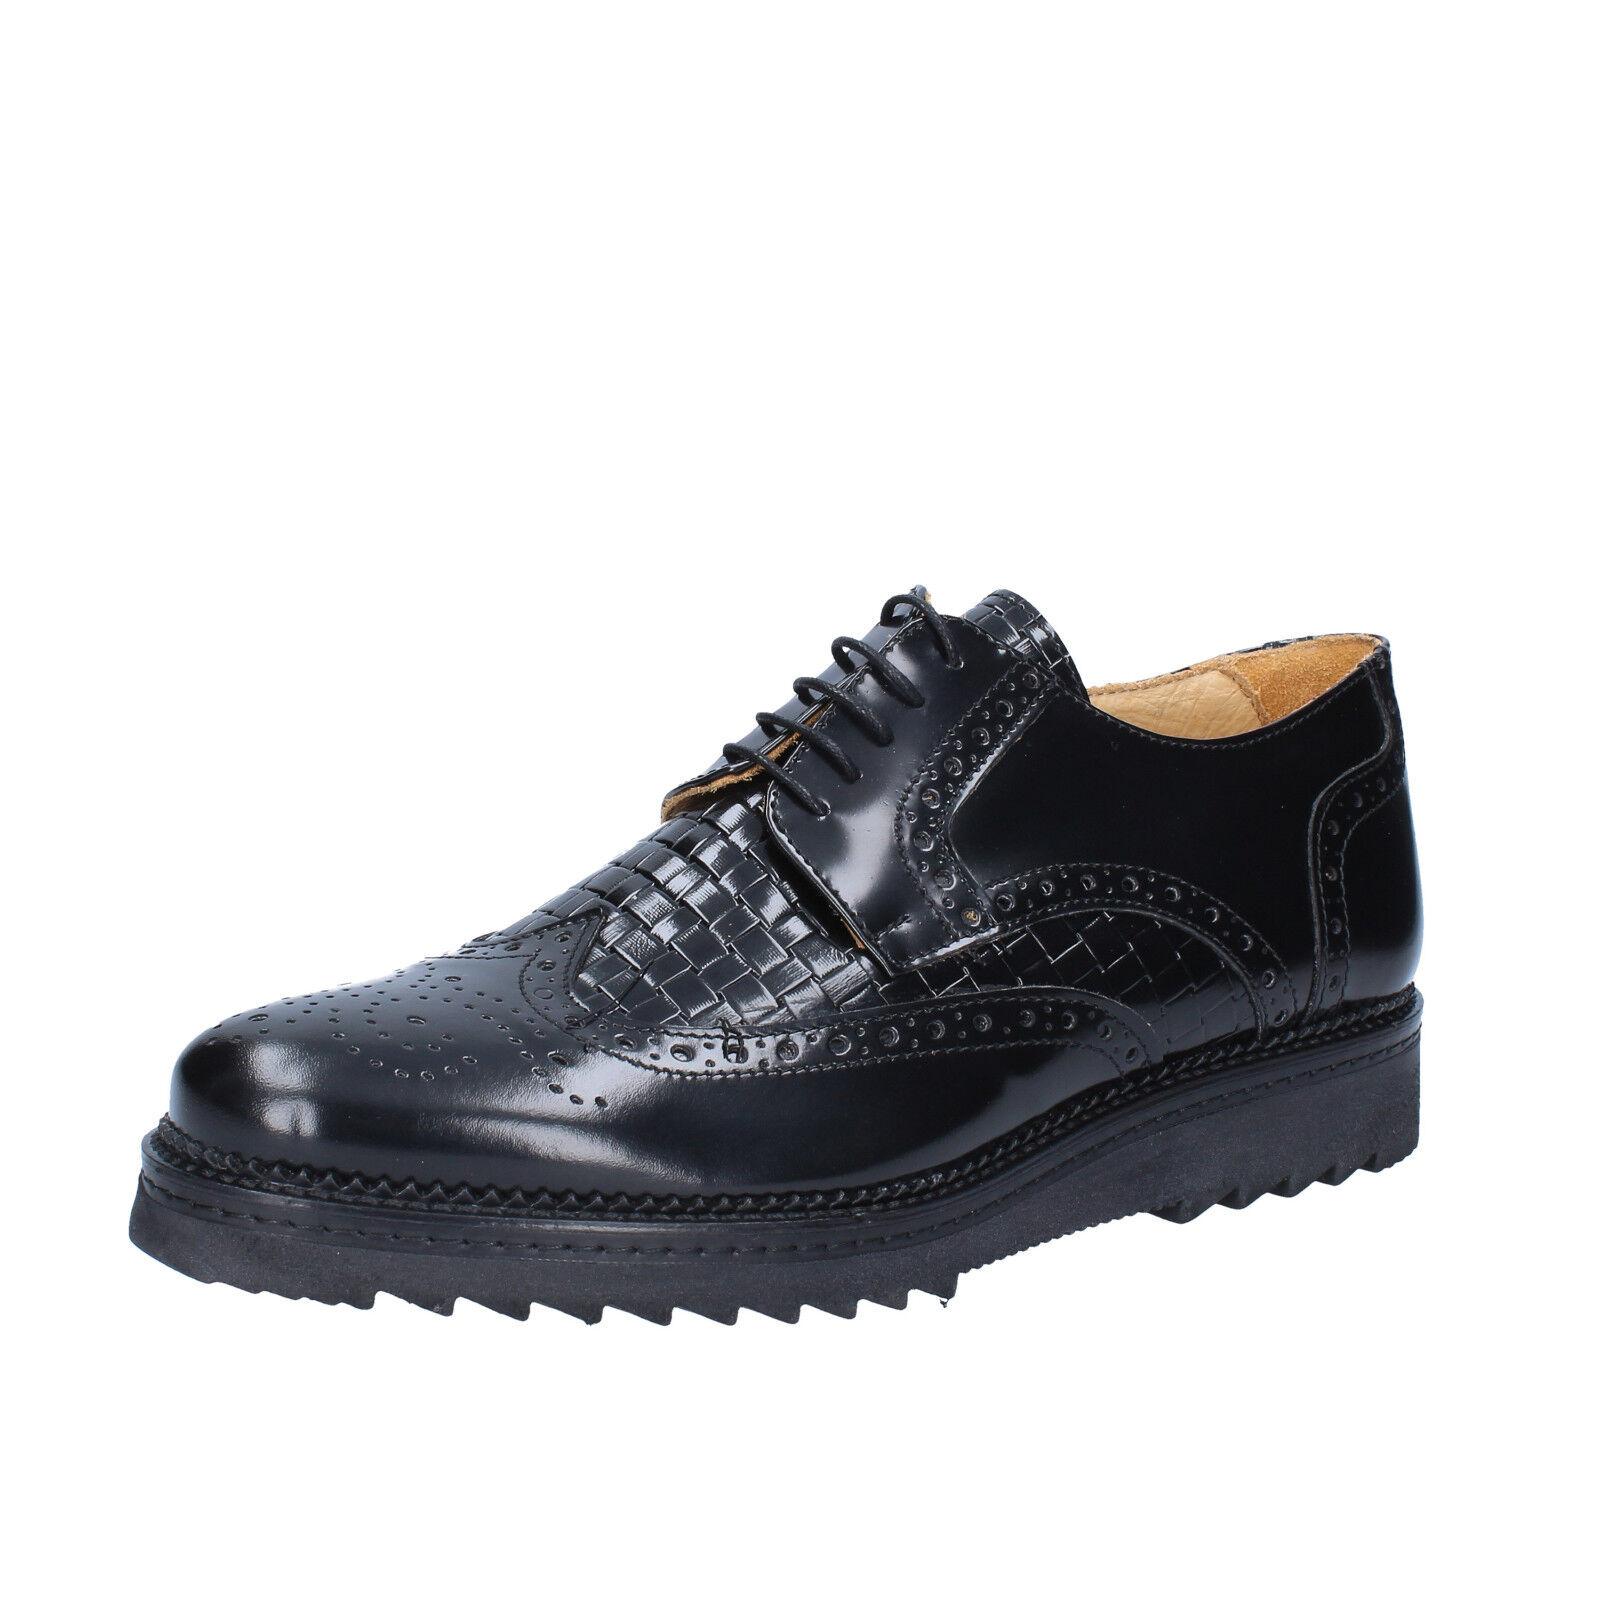 Mens shoes SALVO BARONE 10 ( EU 44 ) elegant black shiny leather  BZ147-F